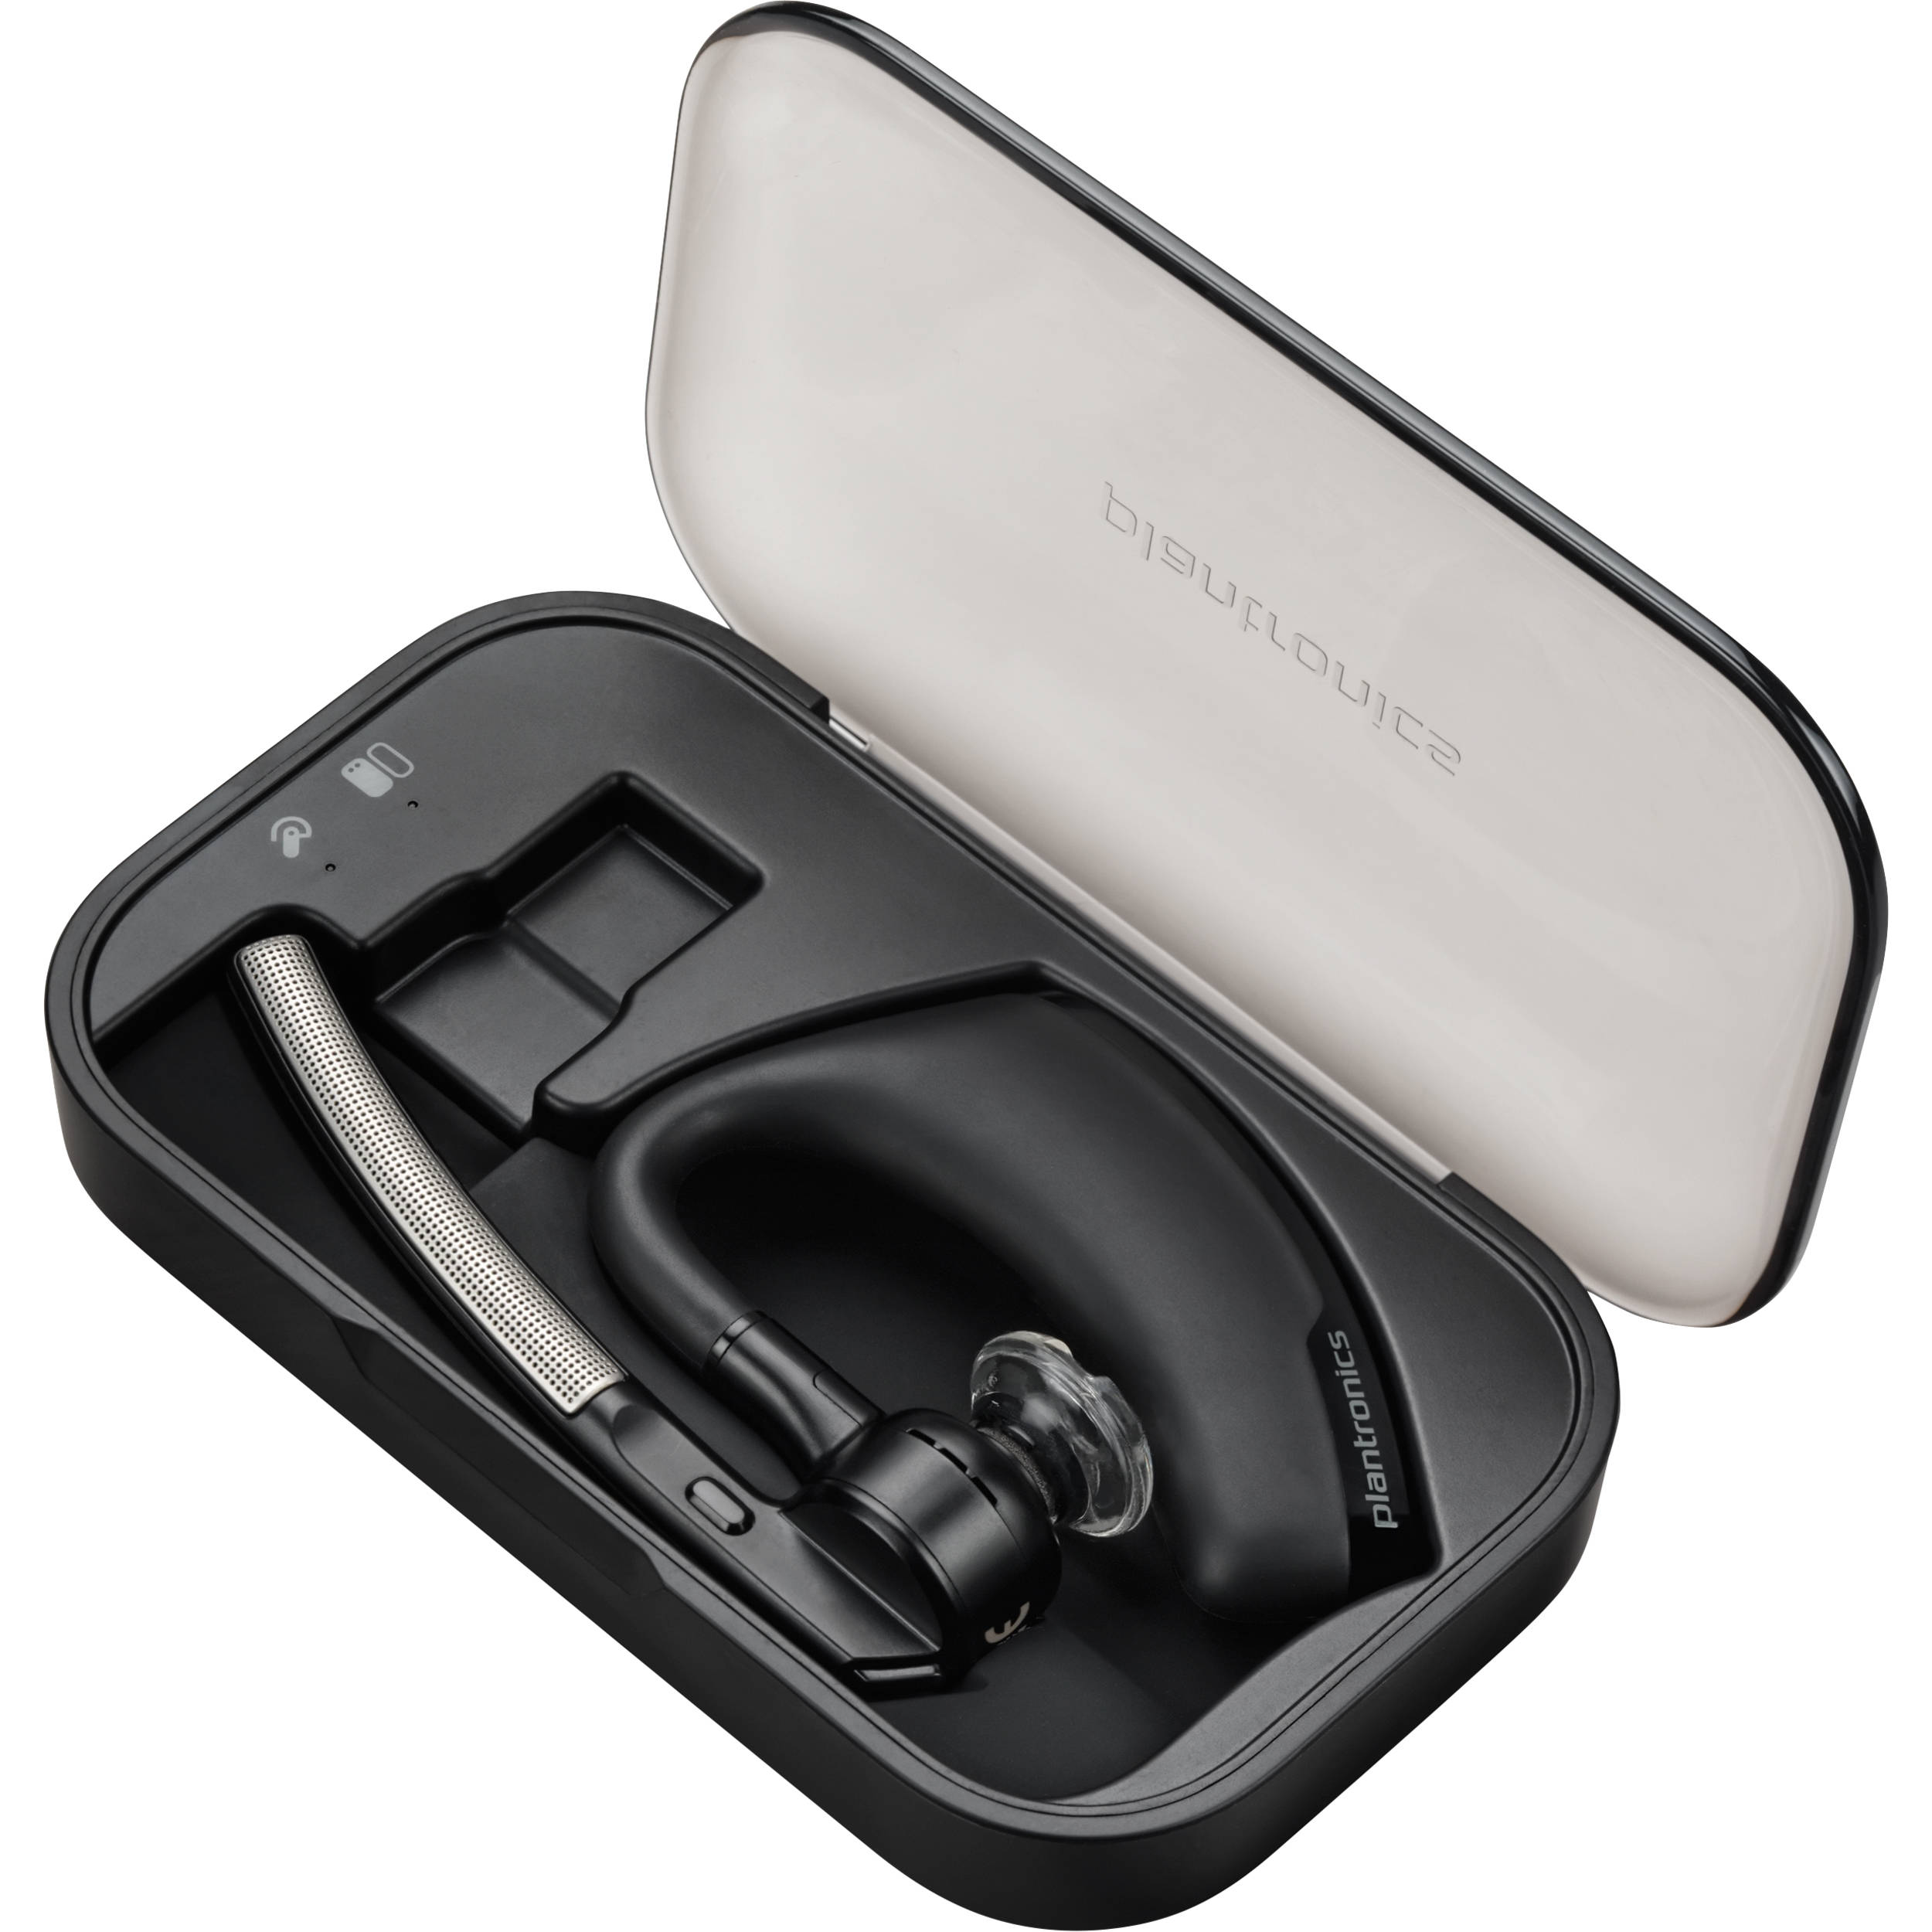 Plantronics Voyager Legend Bluetooth Headset with Case 89880-01 76ca76886c80c